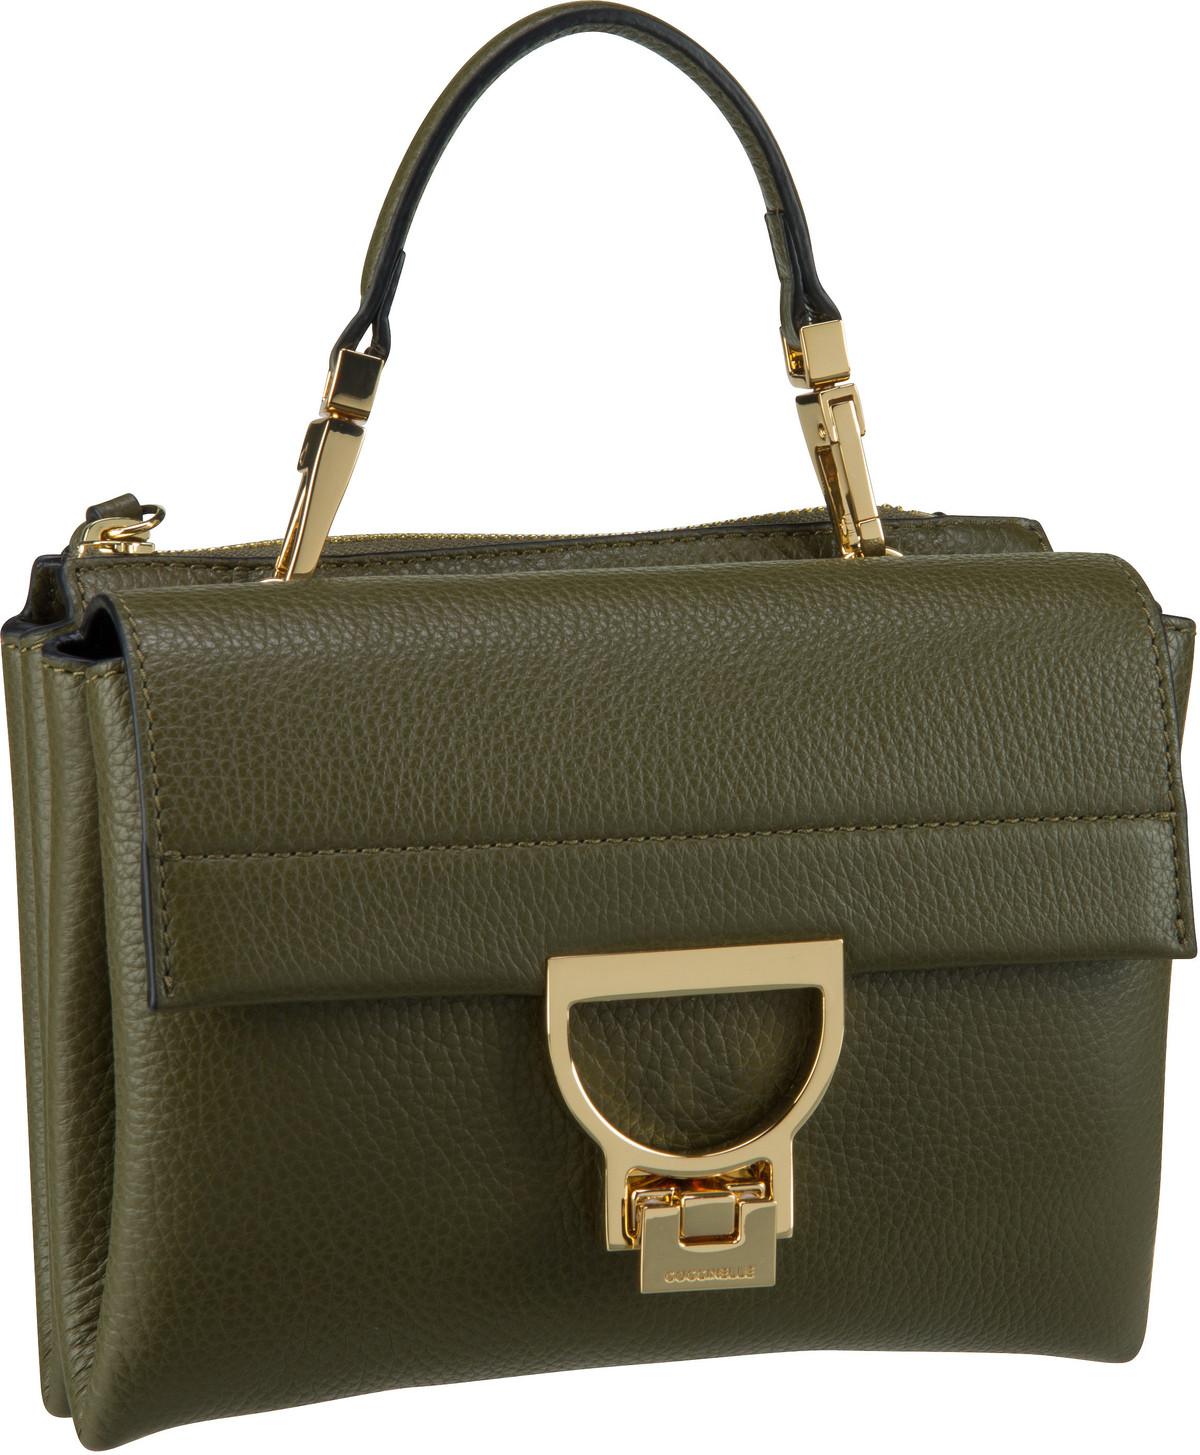 Handtasche Arlettis 55B7 Evergreen